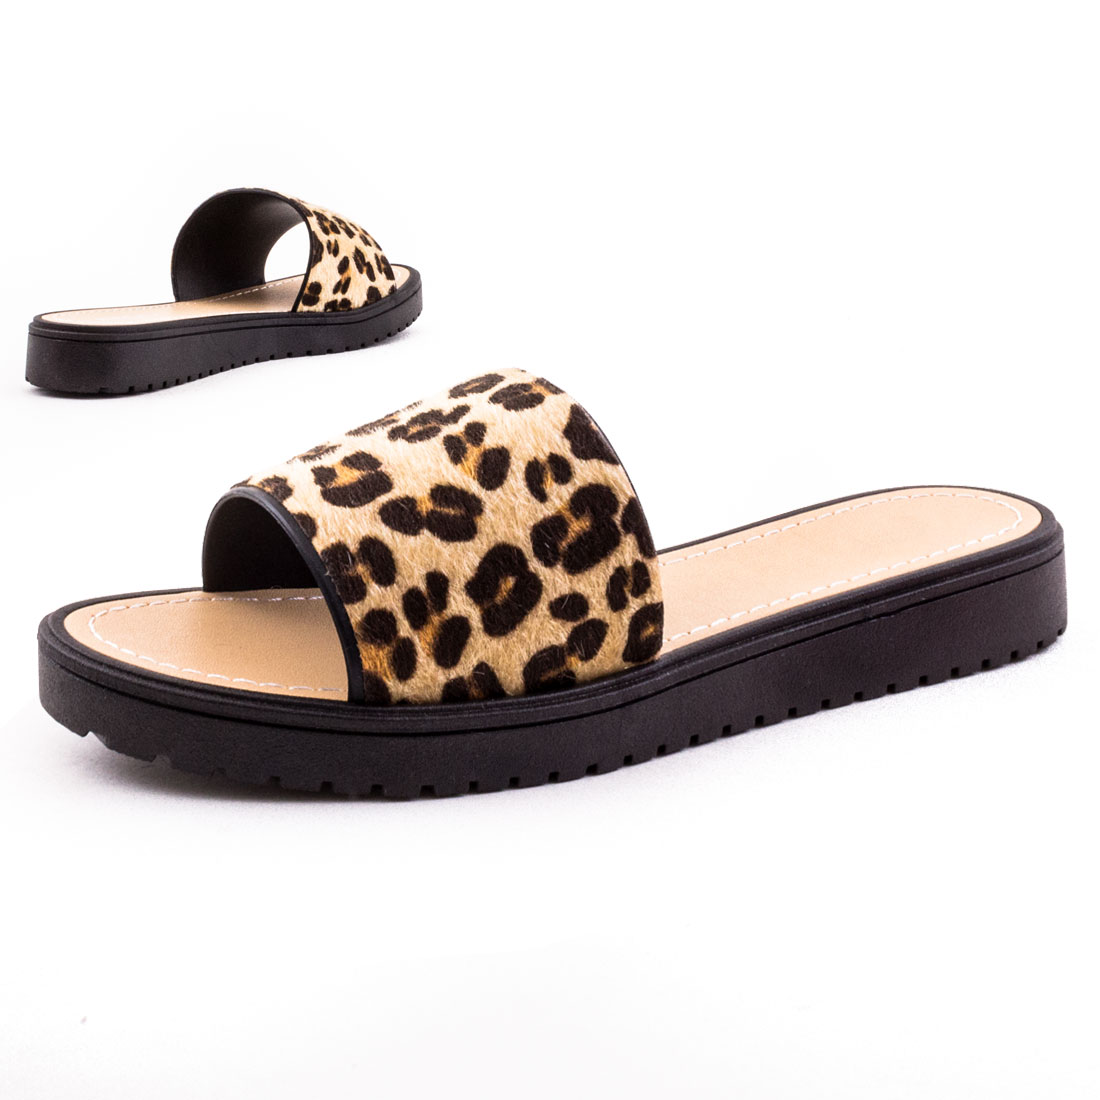 neu damen sommer sandalen slip on schlupf haus schuhe gr 36 37 38 39 40 41 ebay. Black Bedroom Furniture Sets. Home Design Ideas